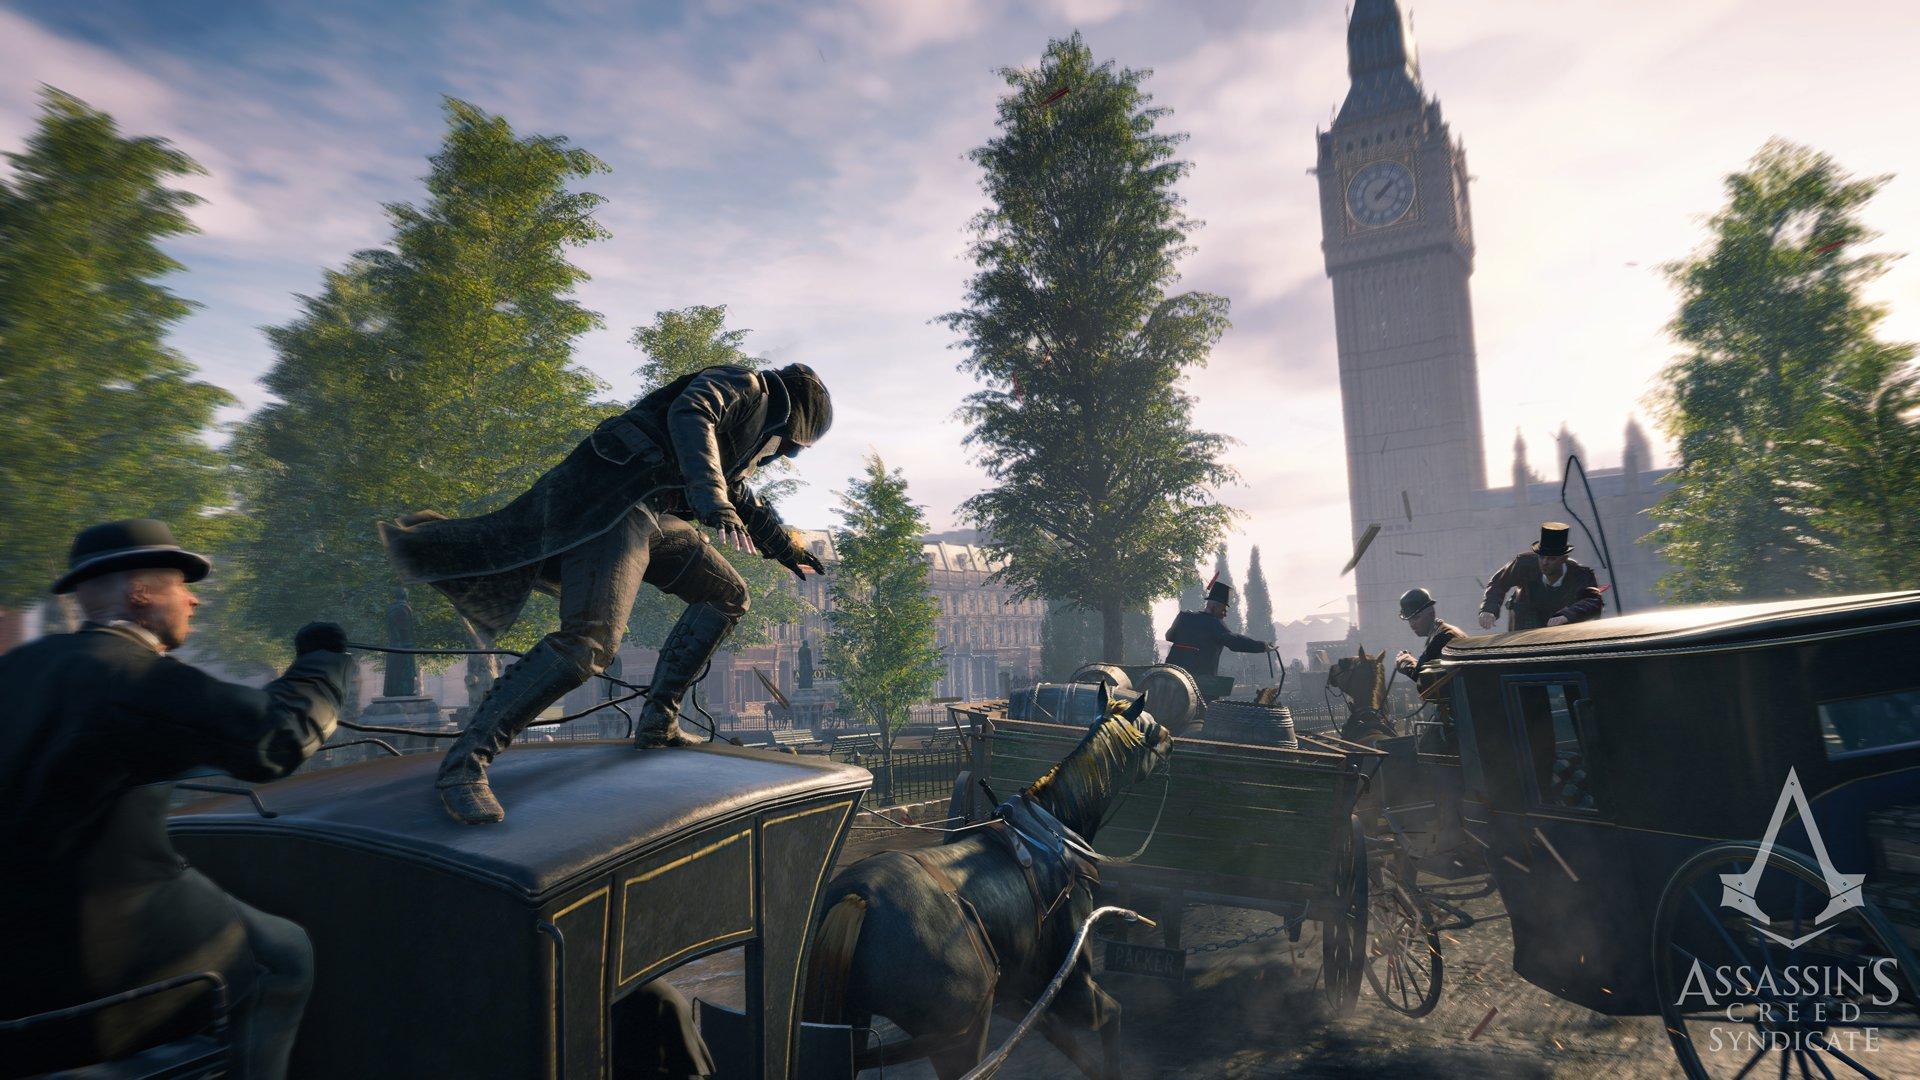 Интересности об Assassin's Creed Syndicate. - Изображение 2